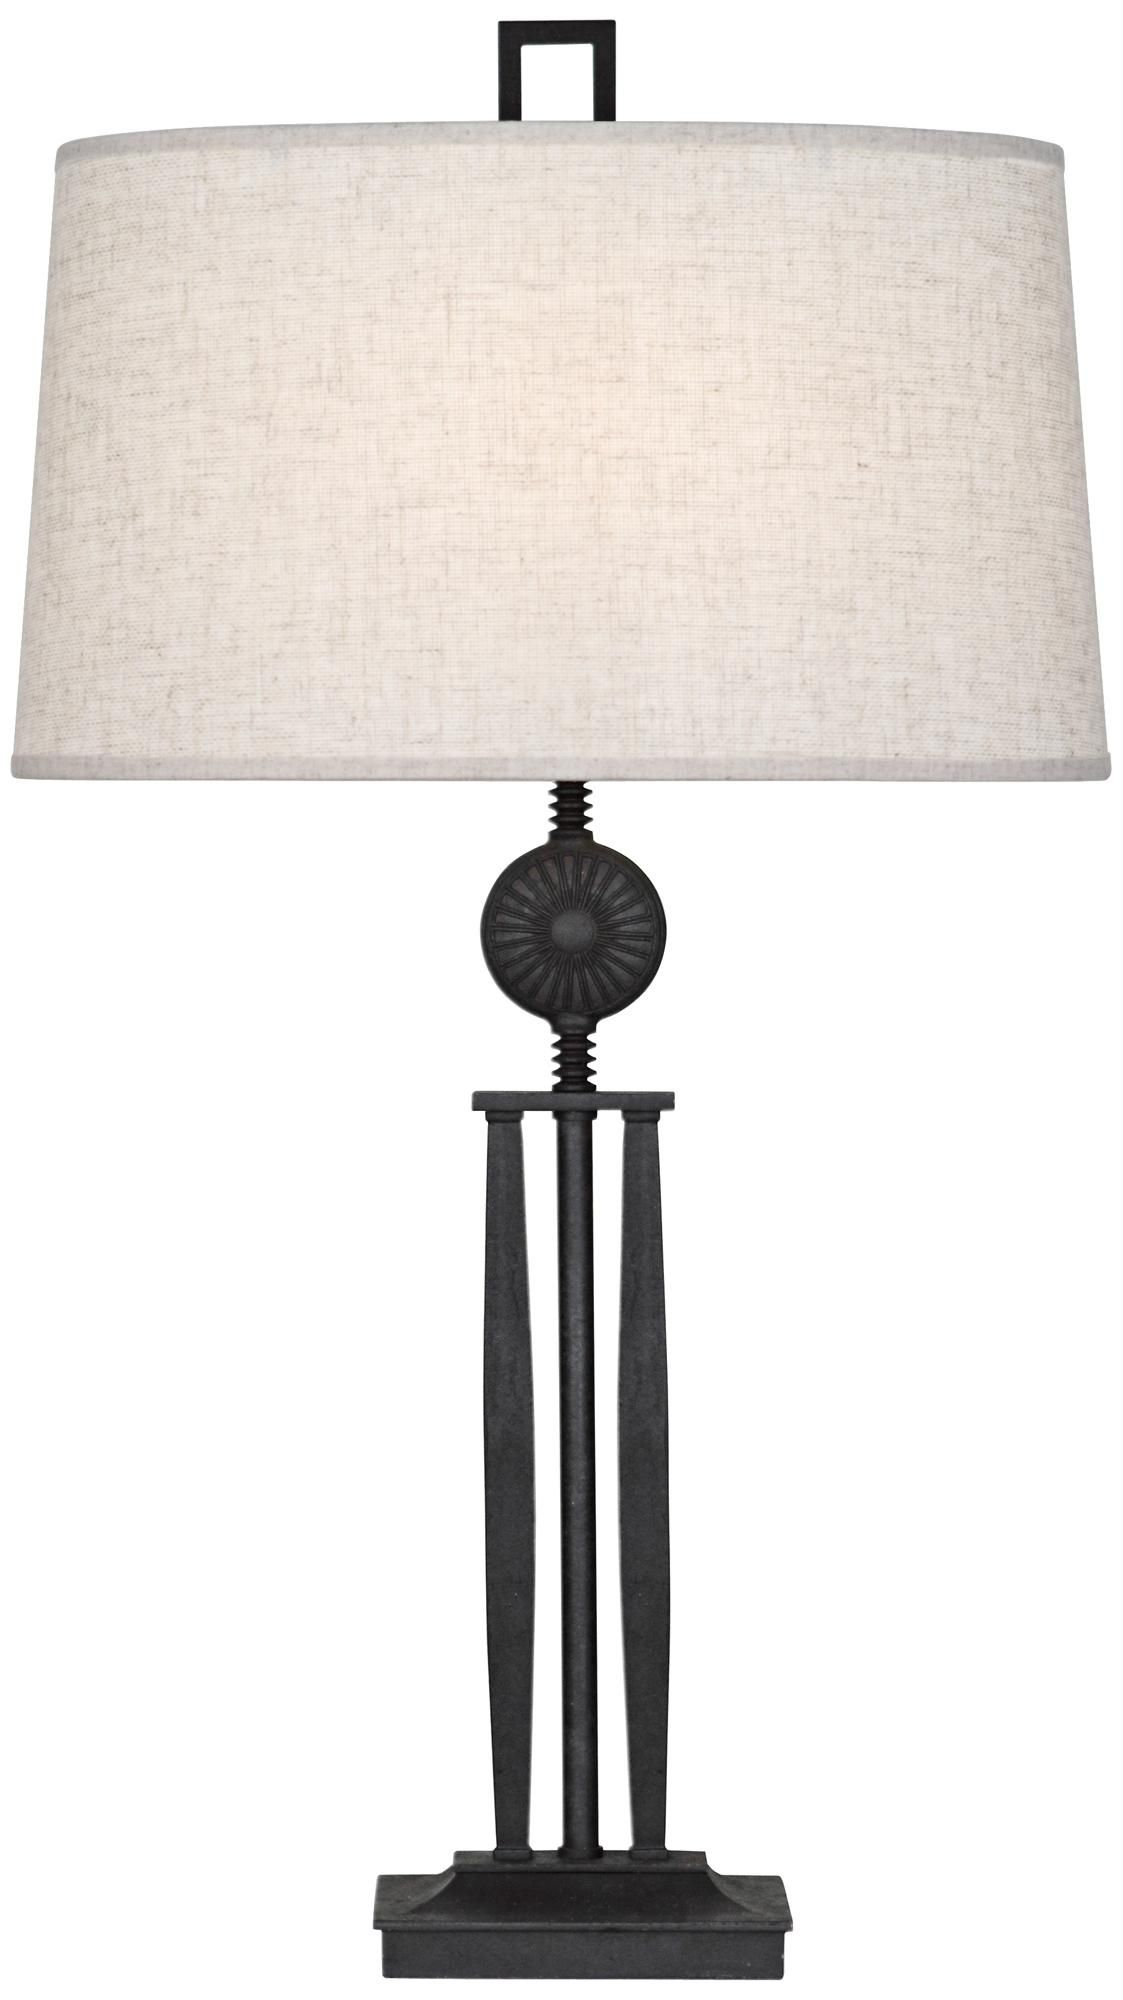 Robert Abbey Badru Wrought Iron Table Lamp Lampsplus